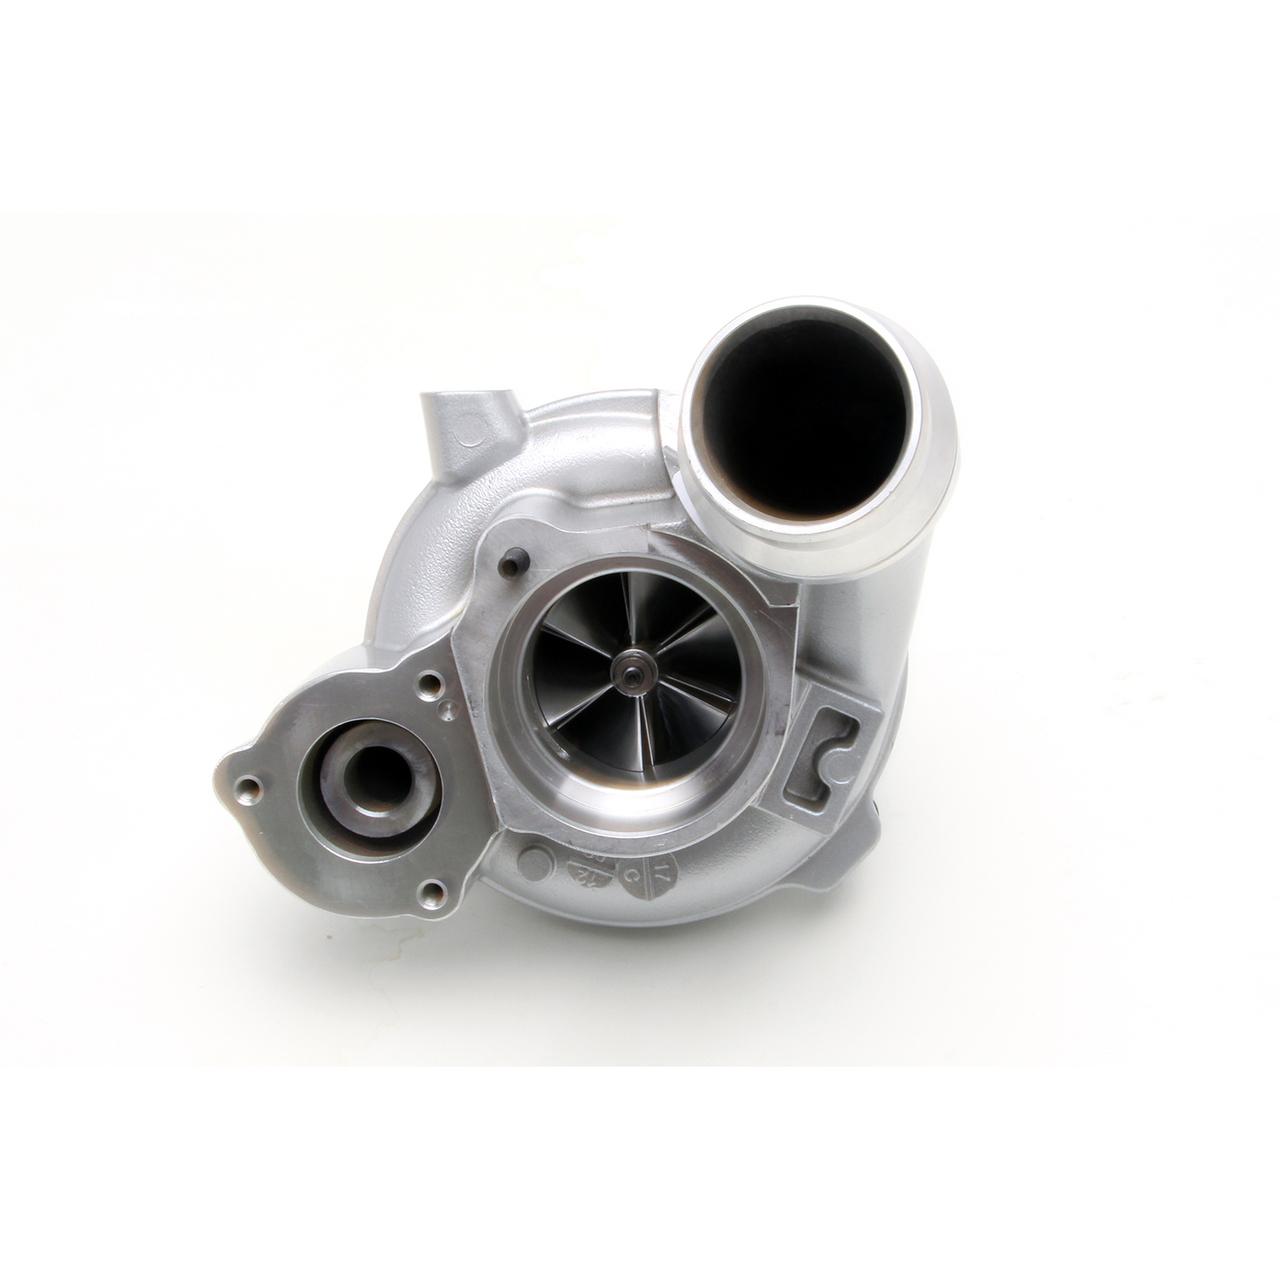 Dinan Big Turbo for the BMW F87 M2 (No Core)